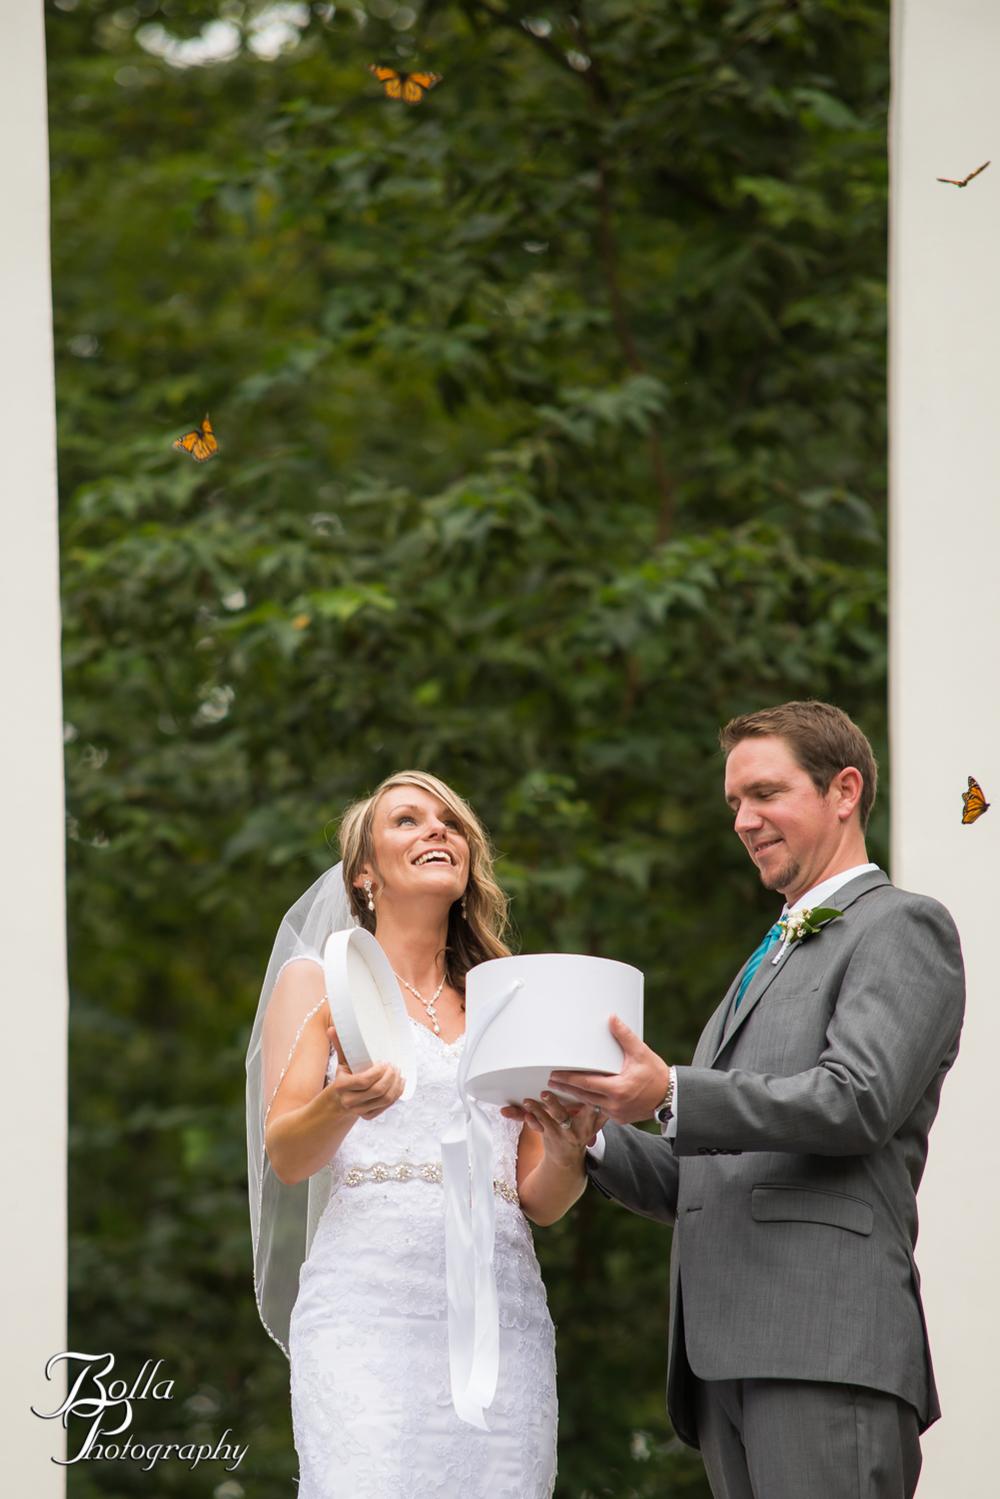 Bolla_Photography_St_Louis_wedding_photographer-0276.jpg